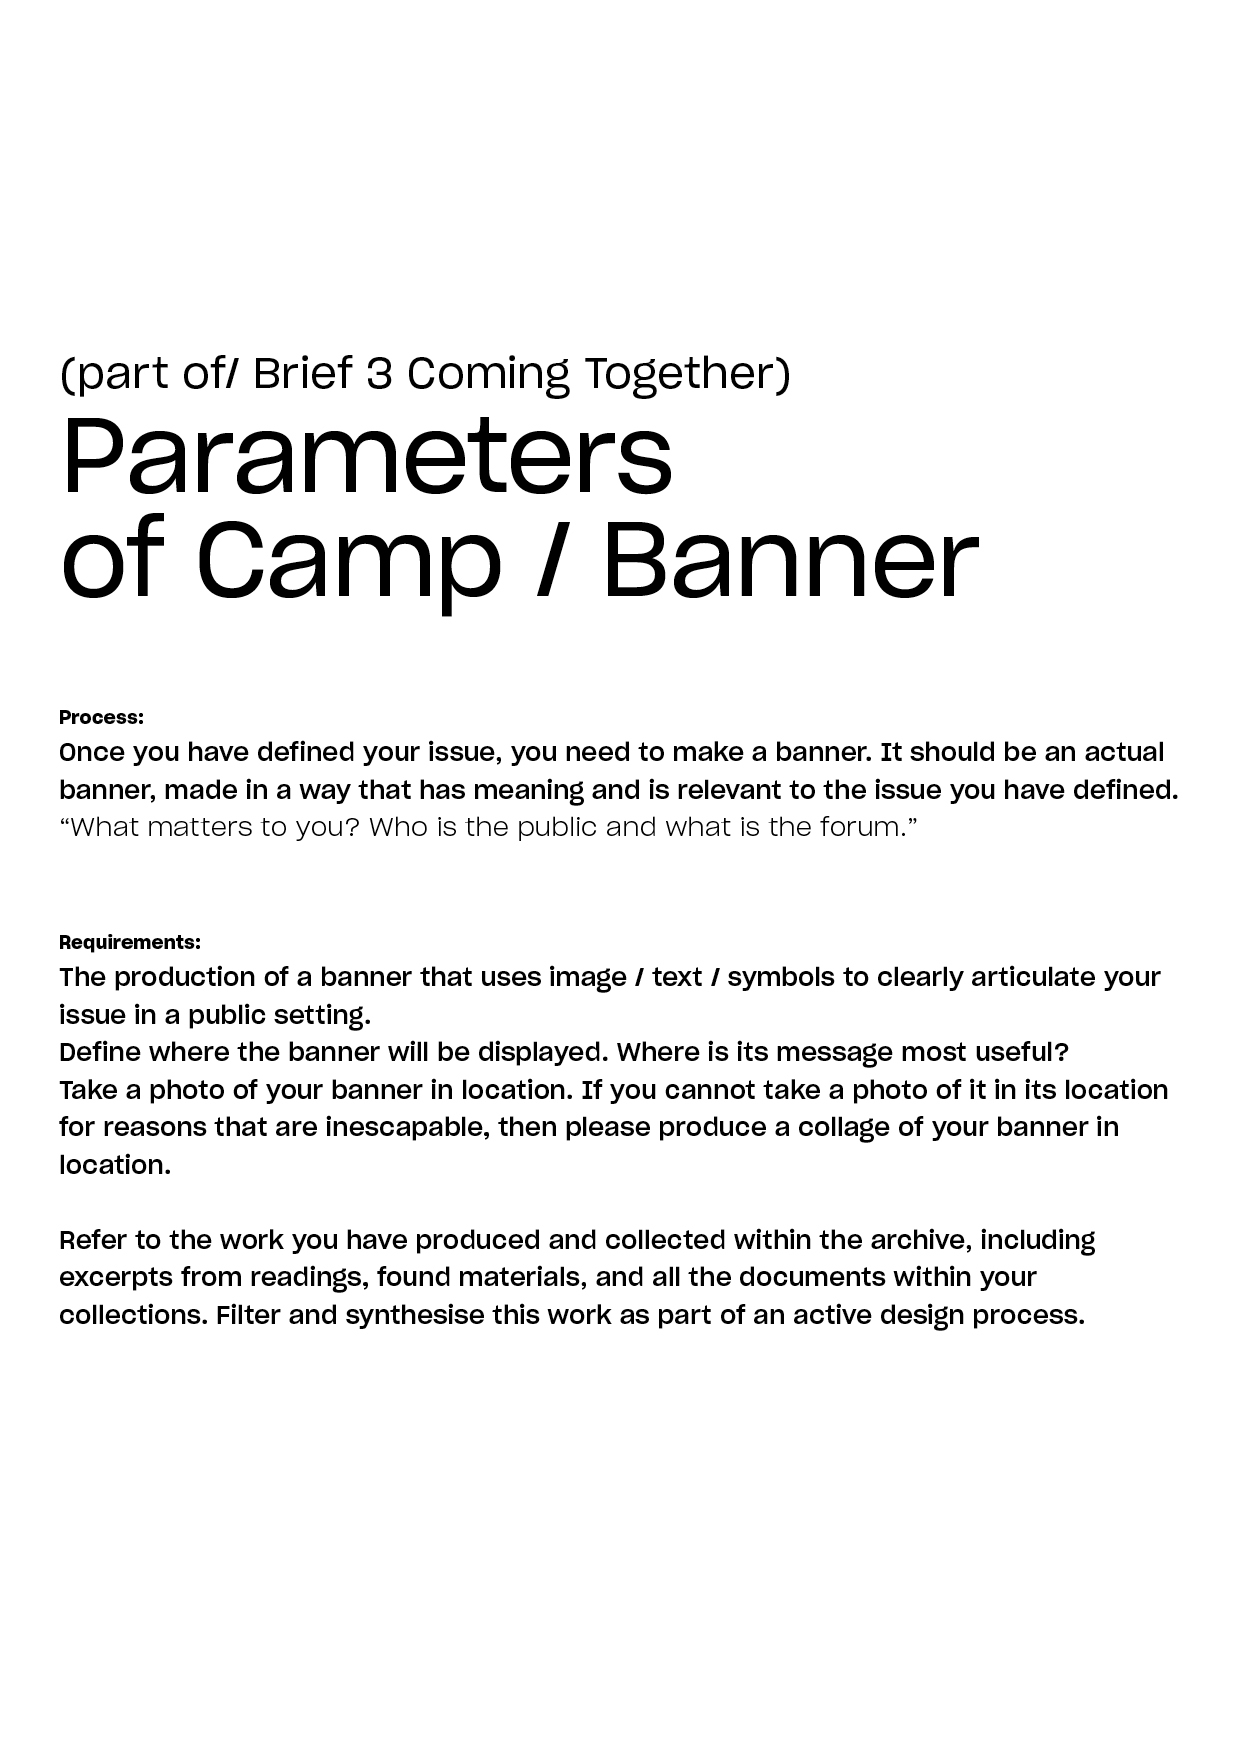 Brief_Counter-Culture-Camp-Ground_0118.jpg